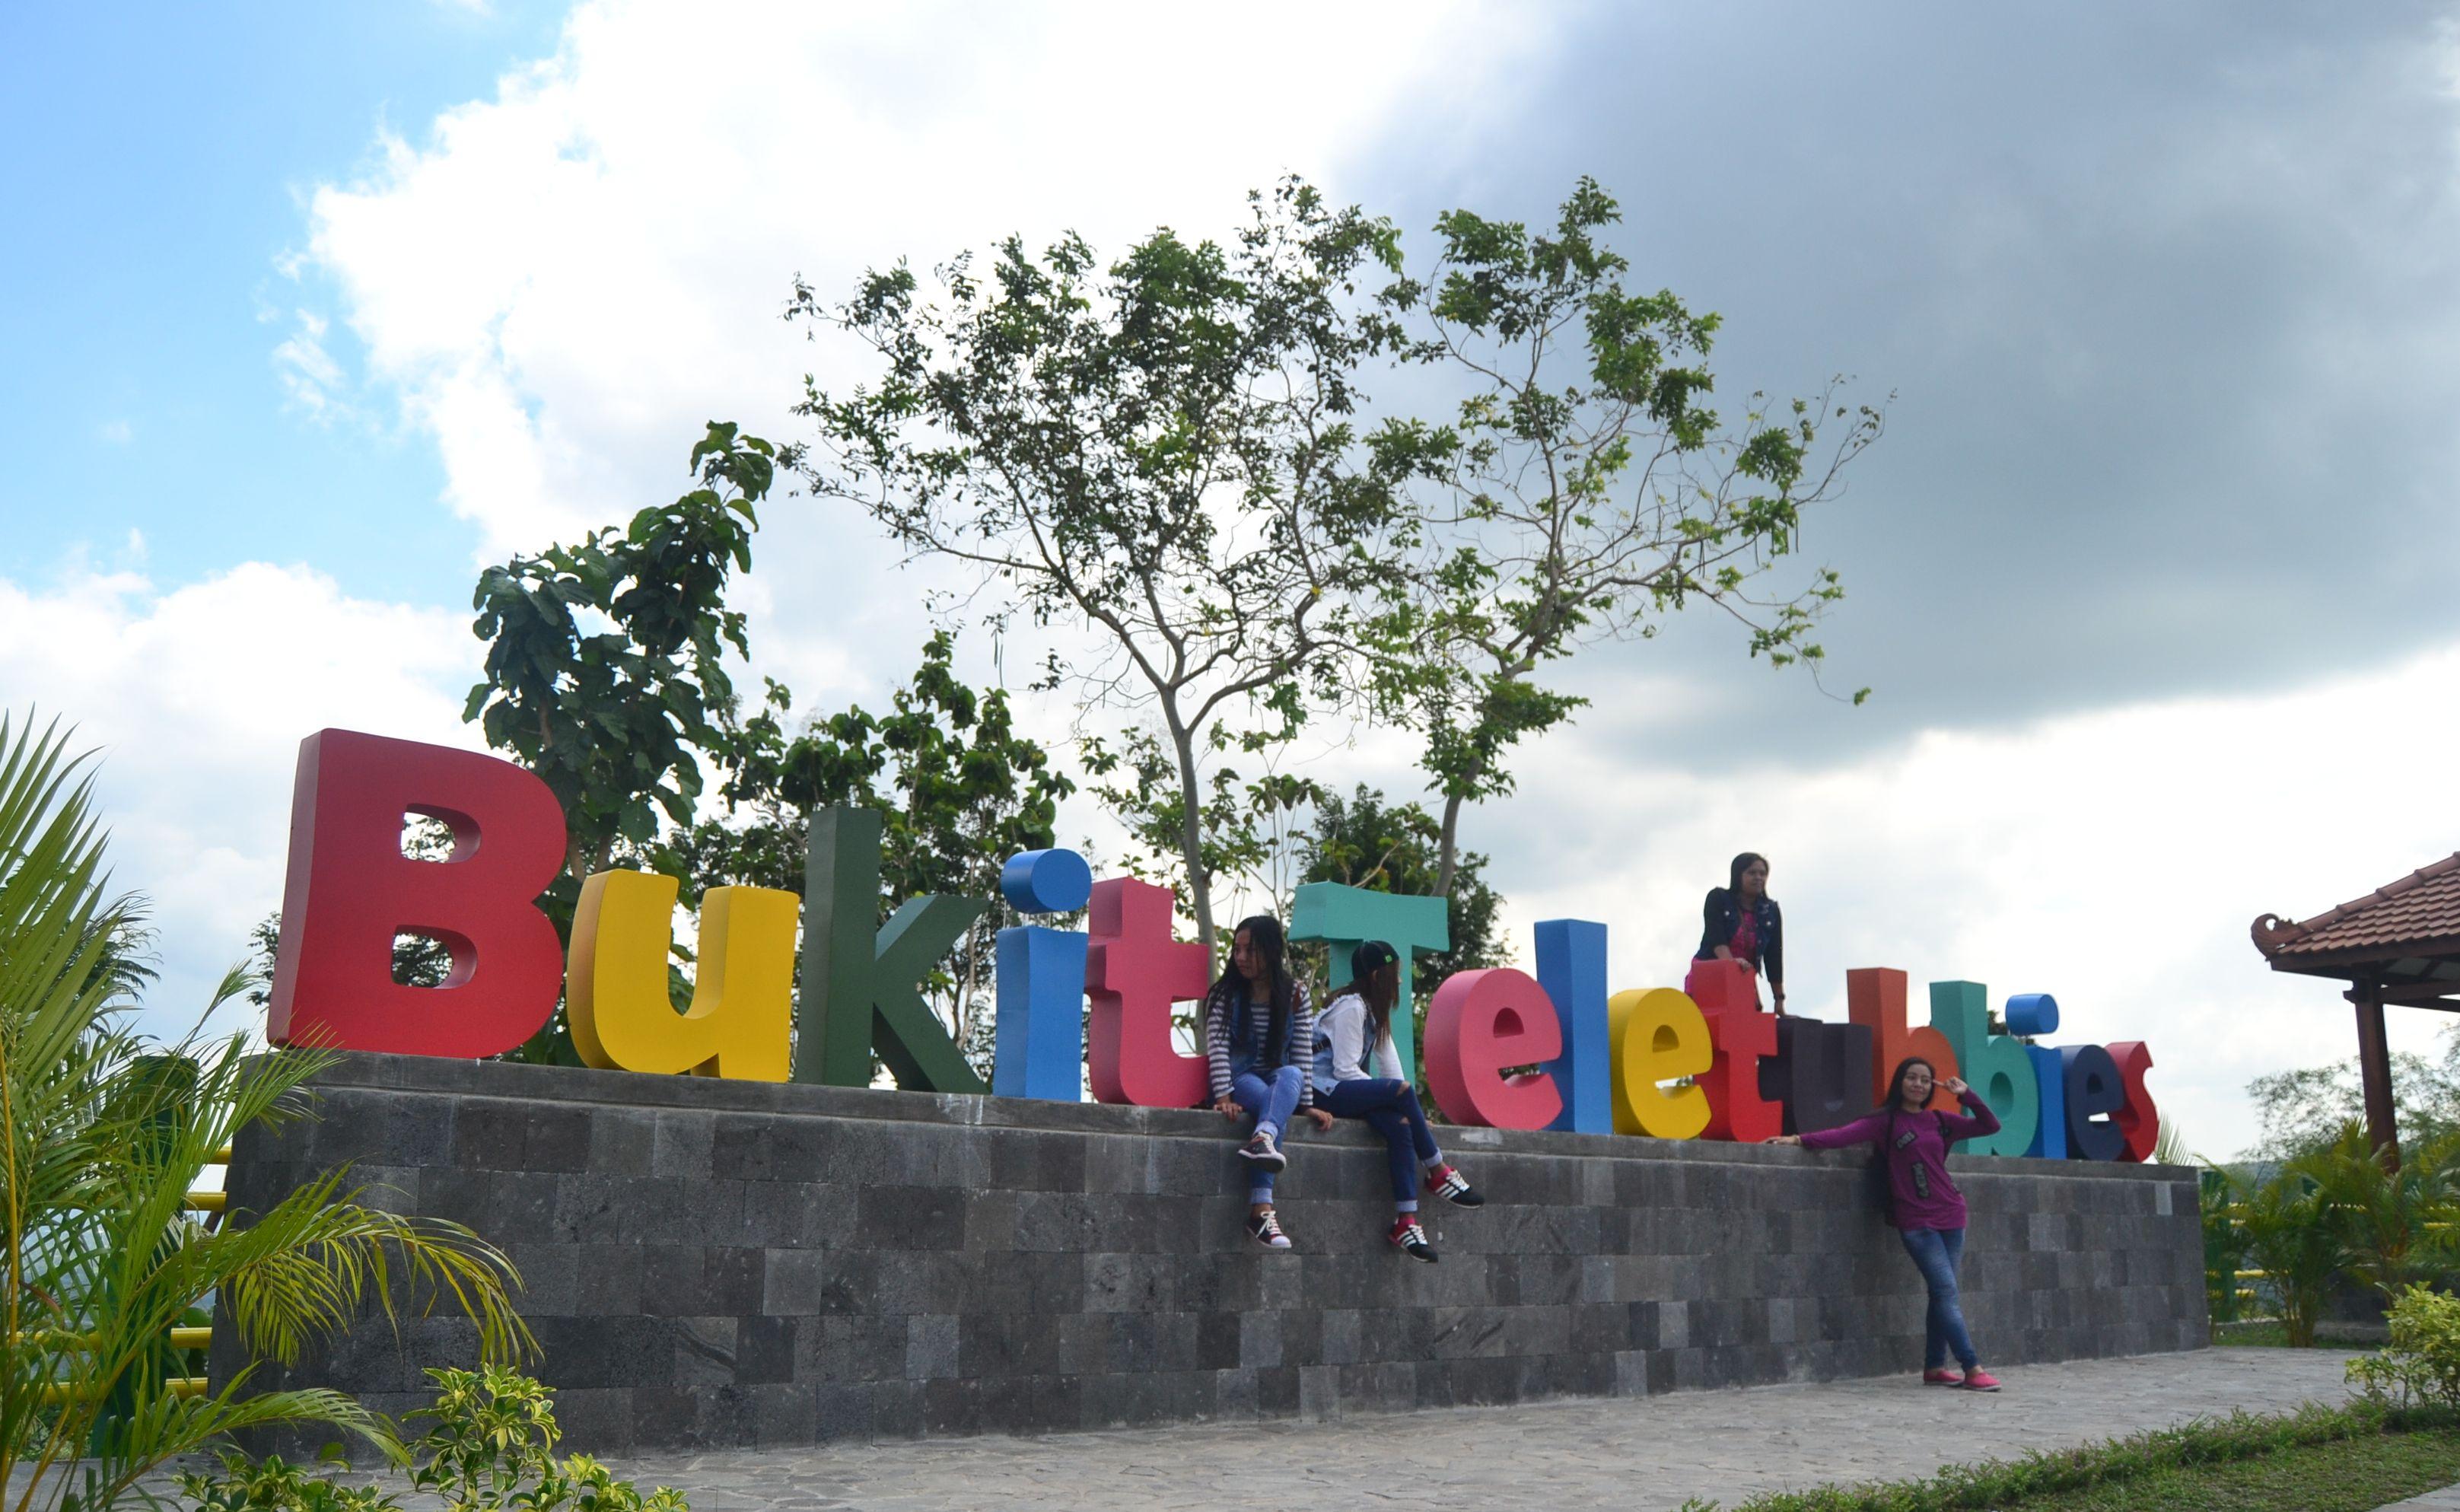 Bukit Teletubbies di atas perumahan New Nglepen. Foto oleh Dyah Ayu Pitaloka/Rappler